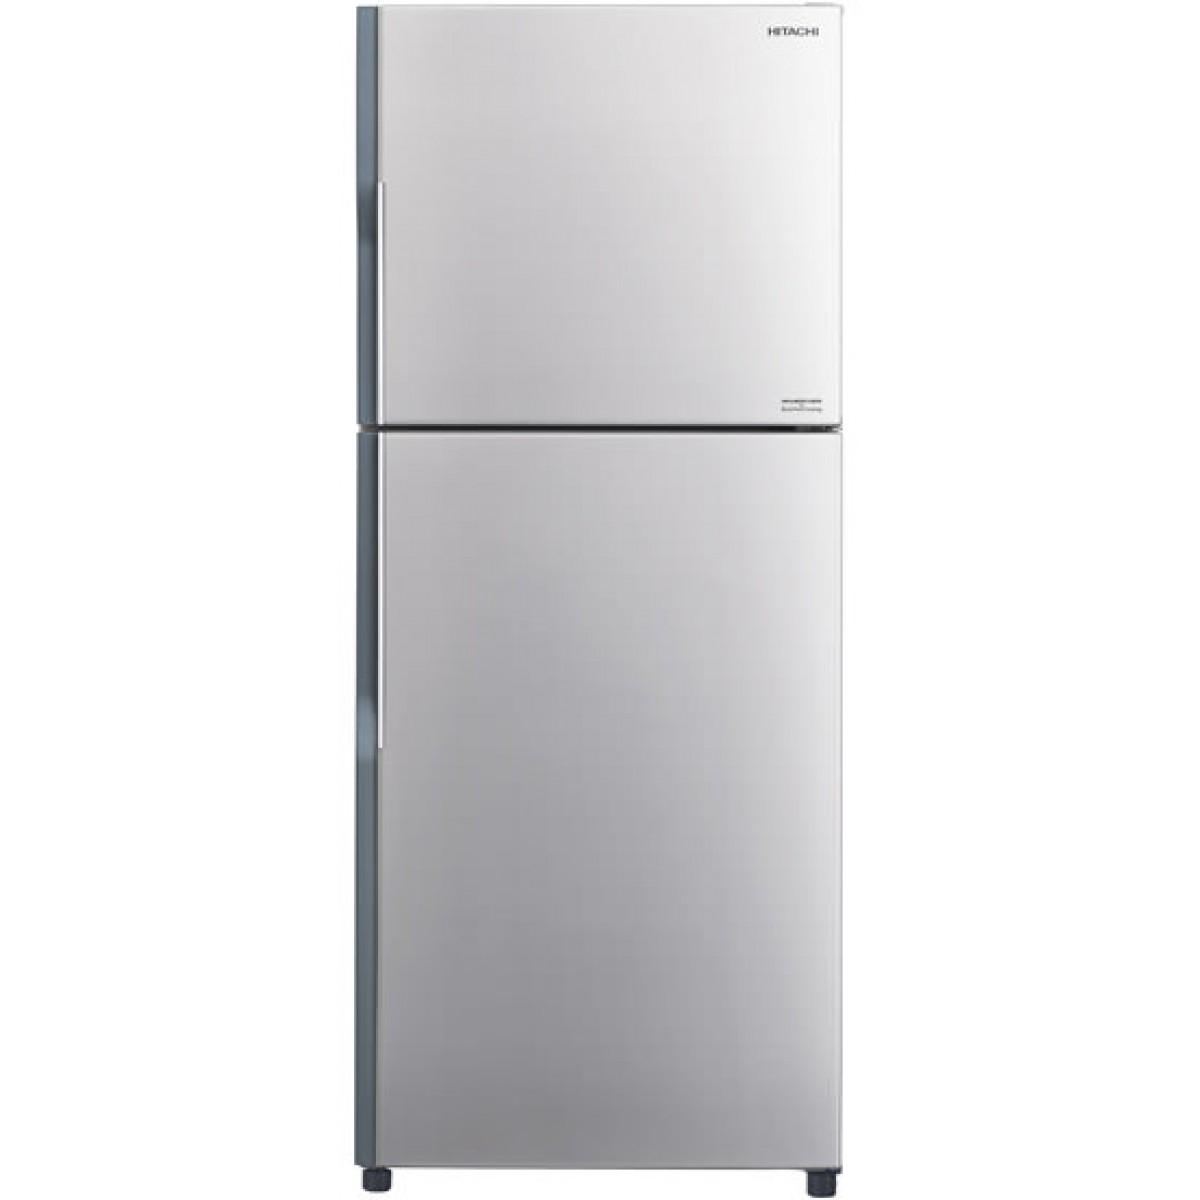 Hitachi R-V400PRU3 (SLS) Ψυγεία δίπορτα Ηλεκτρικες Συσκευες - homeelectrics.gr